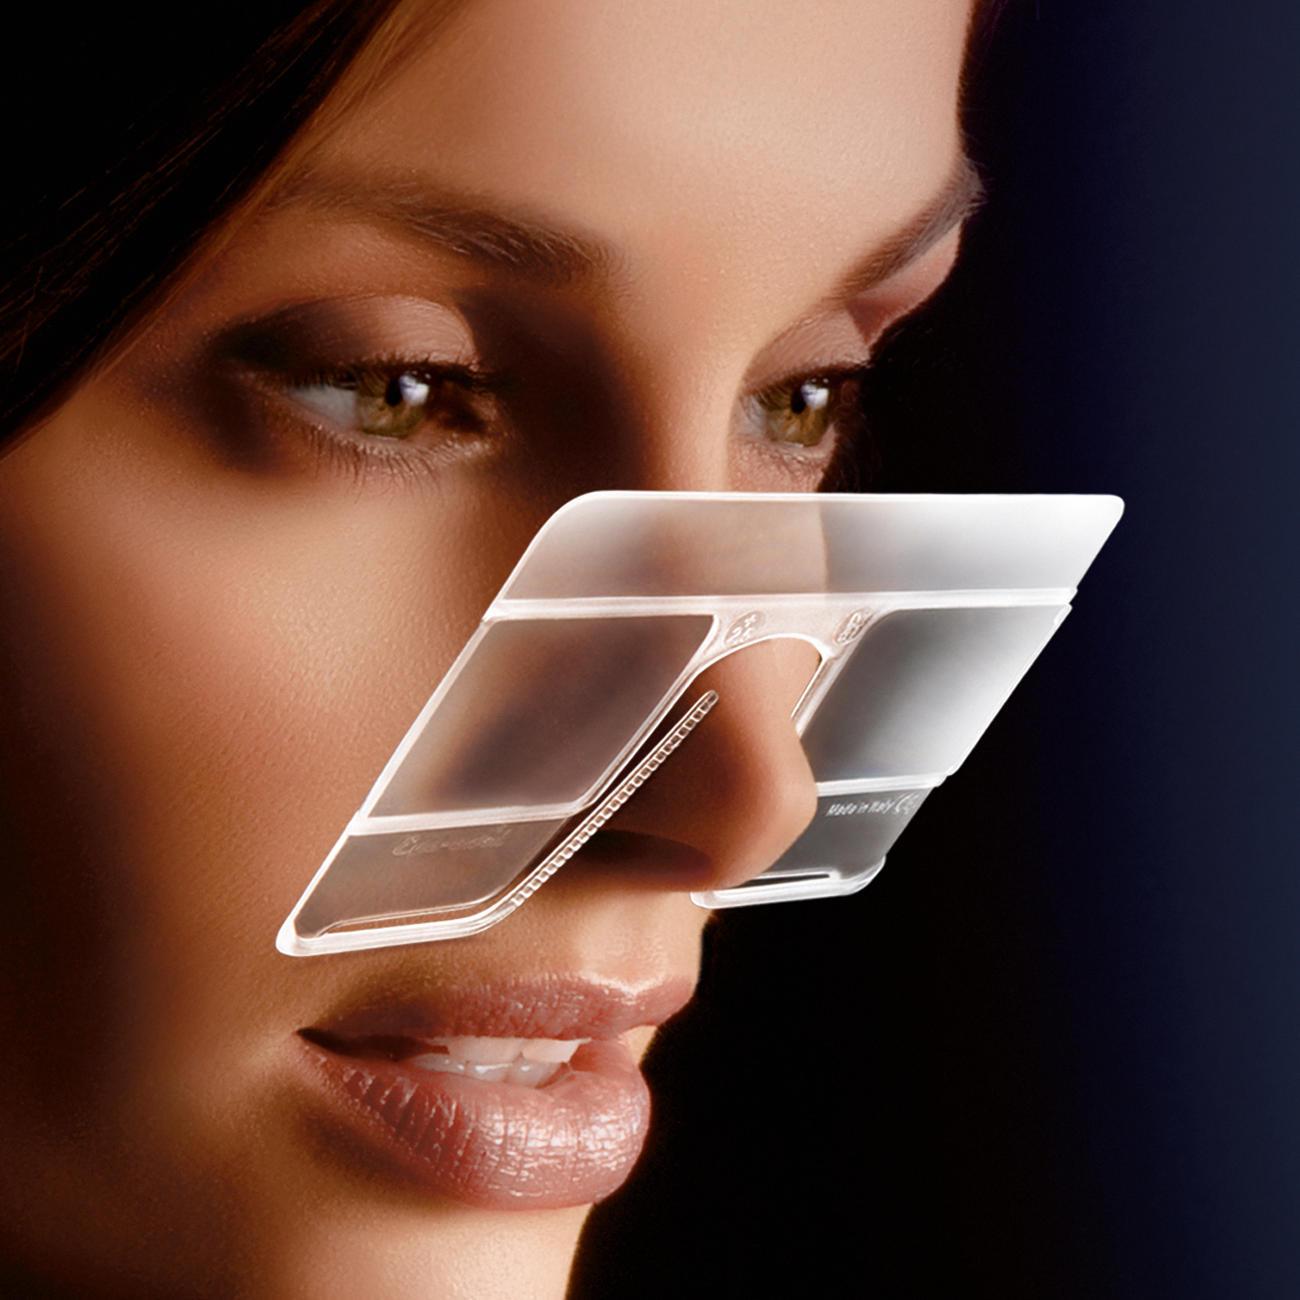 Buy Eyecard 174 Set Of 2 3 Year Product Guarantee